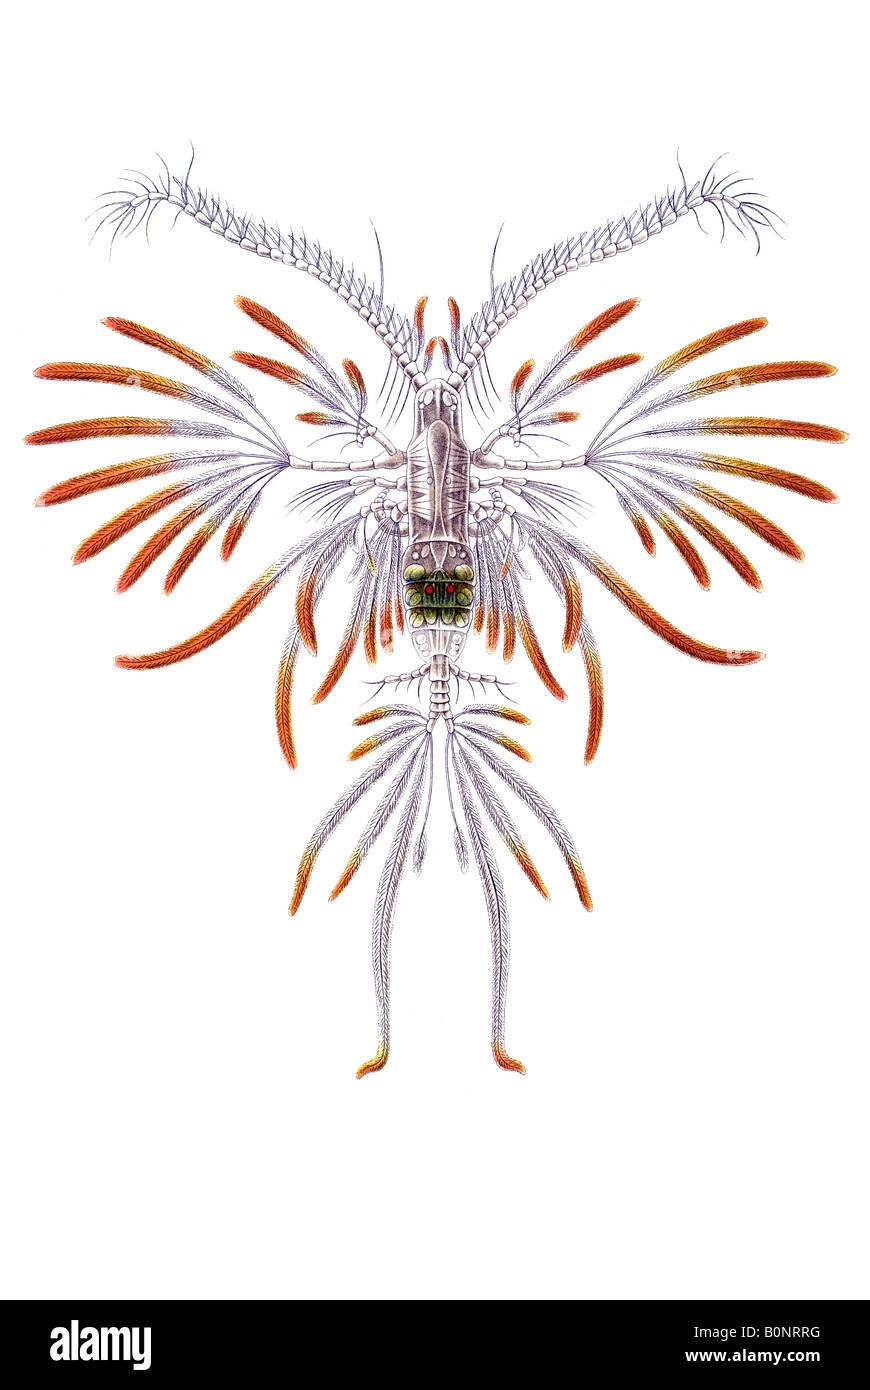 Copepoda Ruderkrebse Name Calanus Pavo Haeckels Kunstformen der Natur Jugendstil 20th Century Europe Stockbild